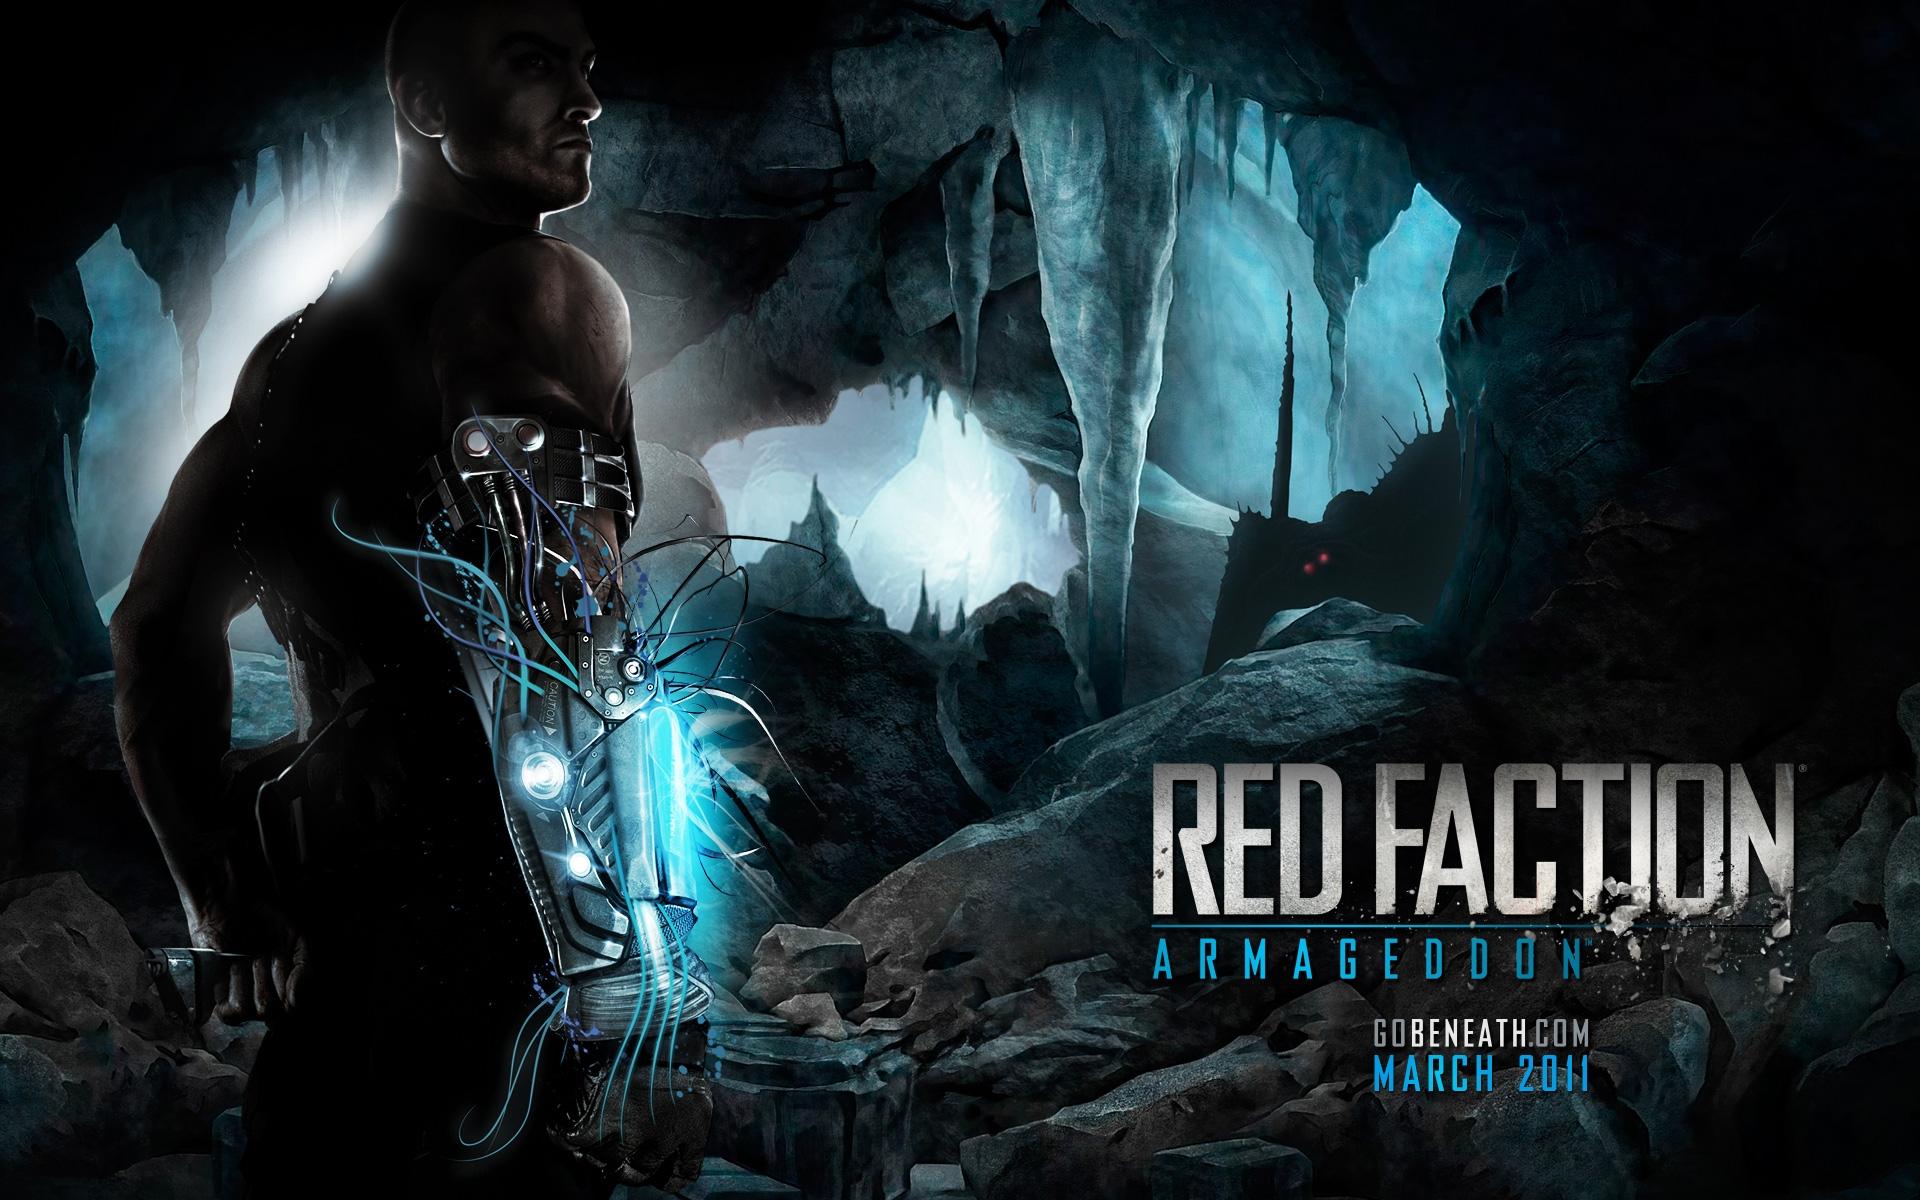 red_faction_armageddon logo